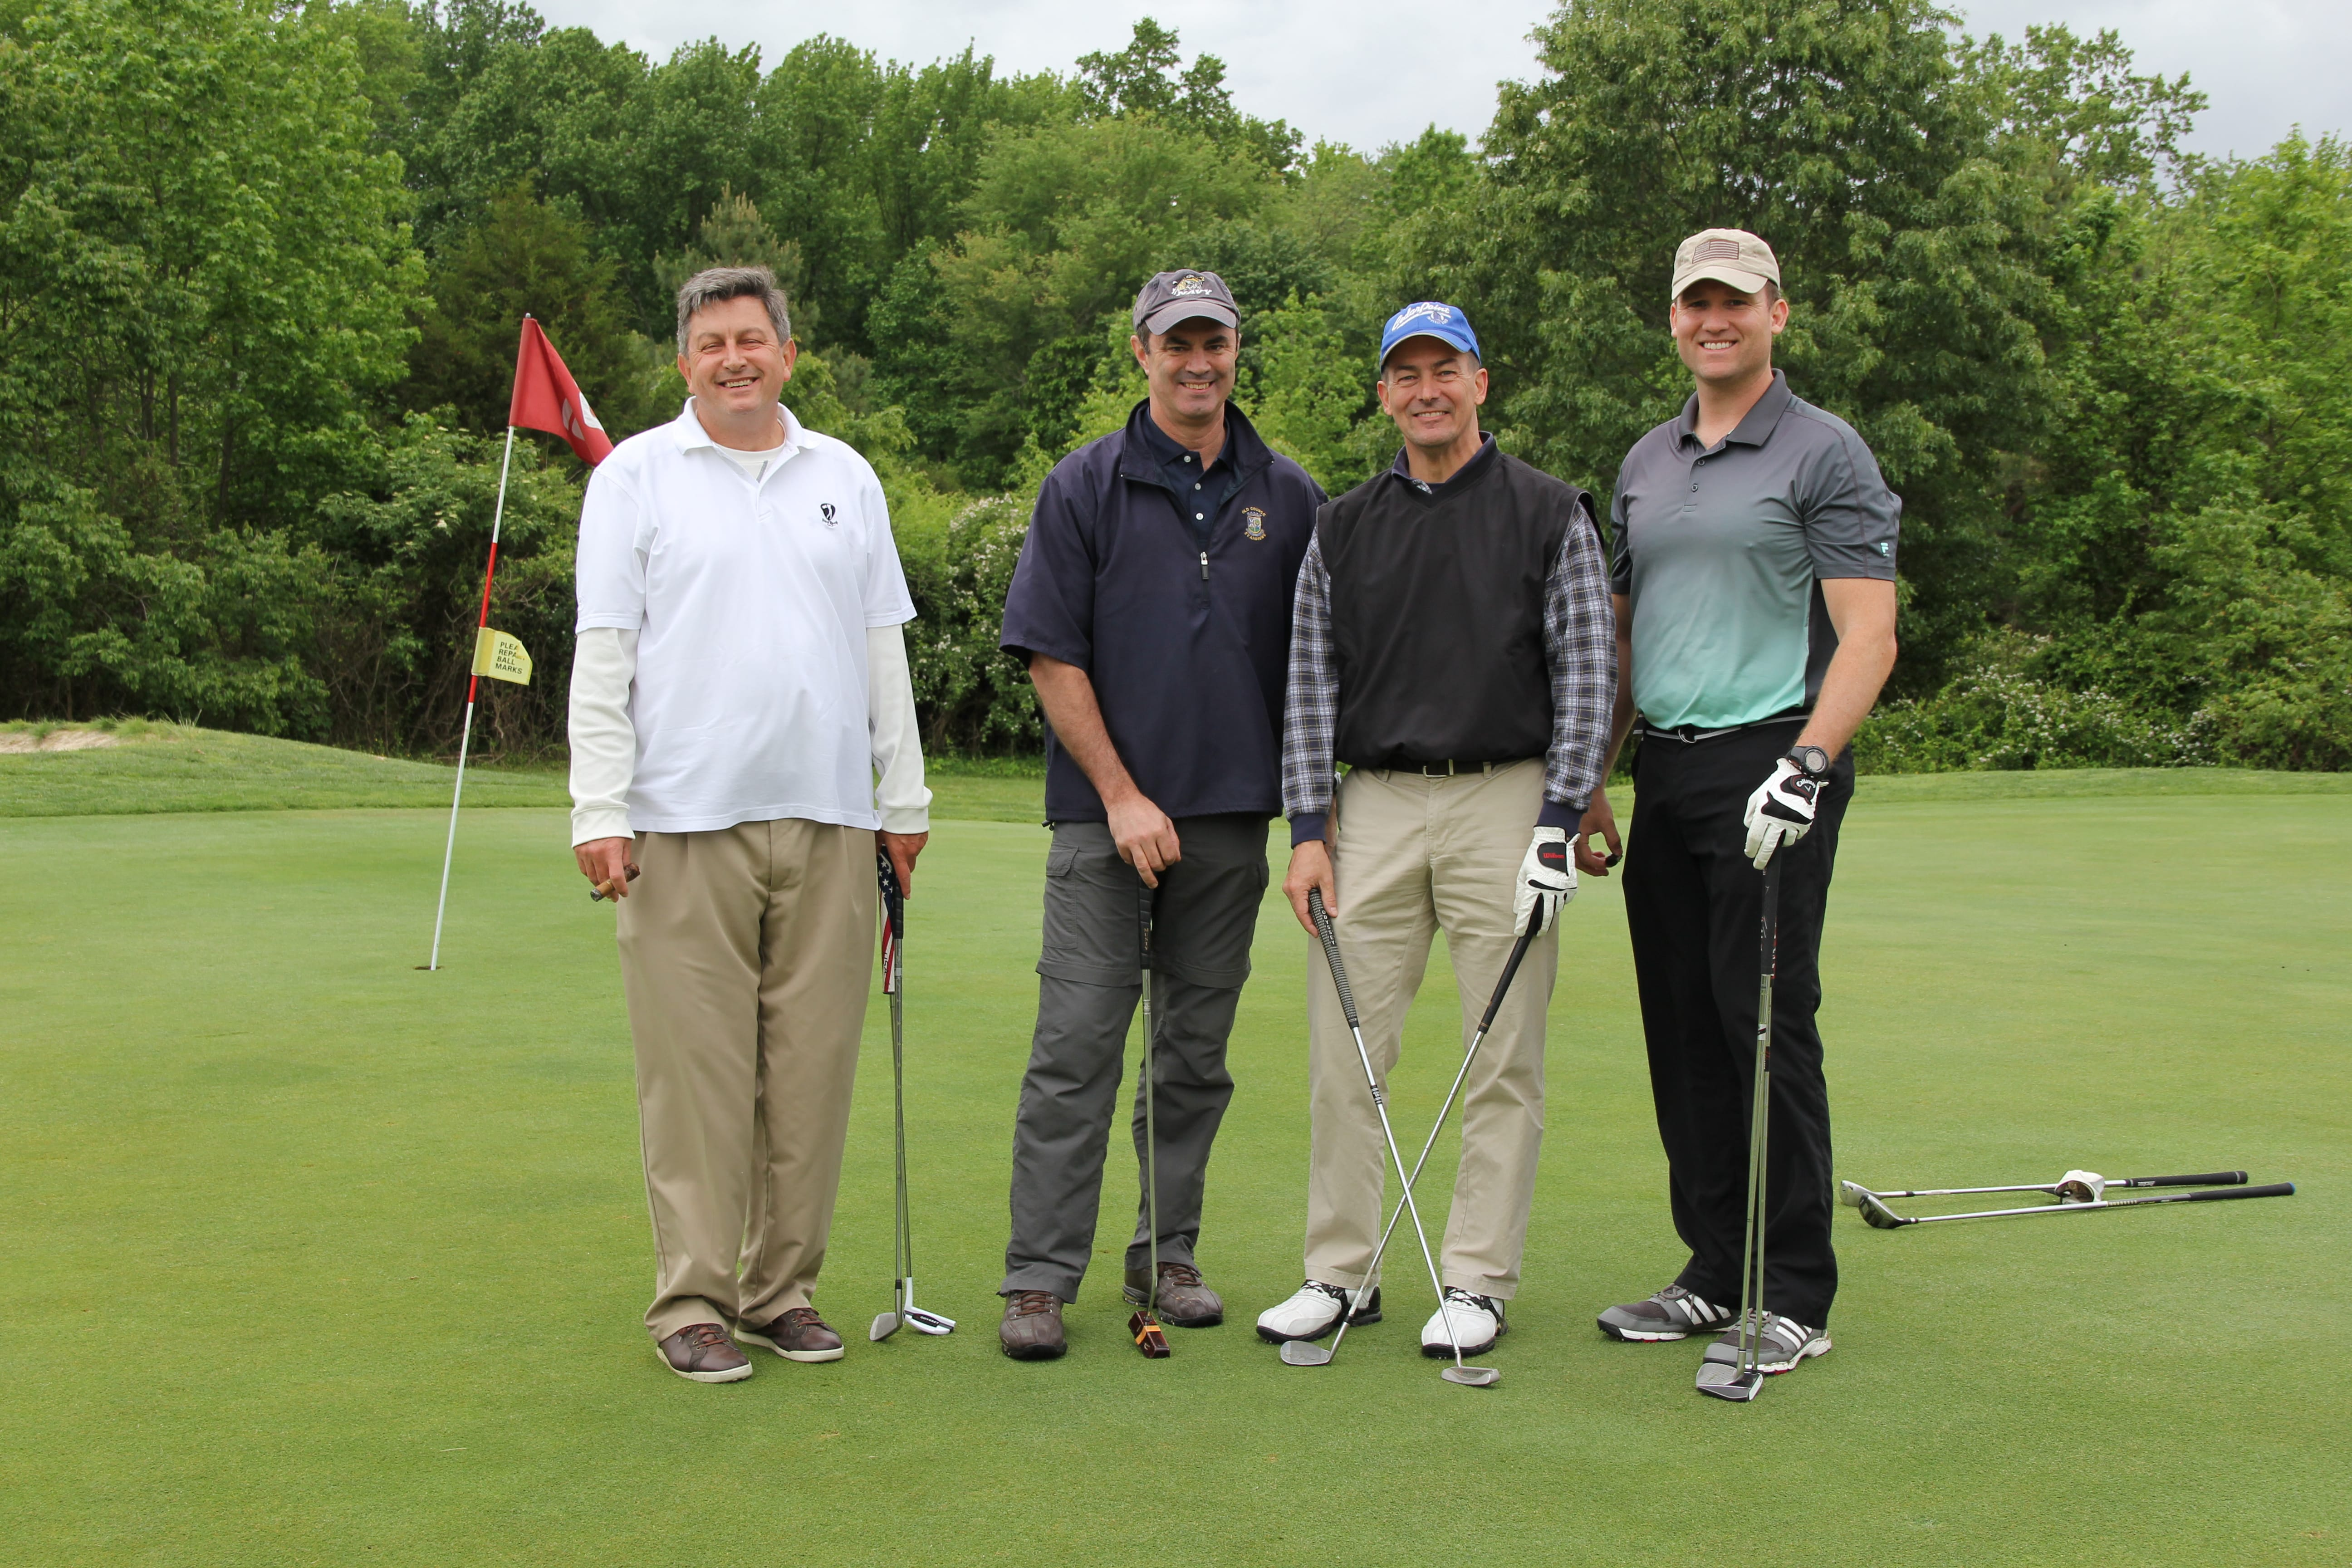 IMG_5948 - Team 16 - Tom Jones, Joe Eversole, Mike Shelton, Dave Smith